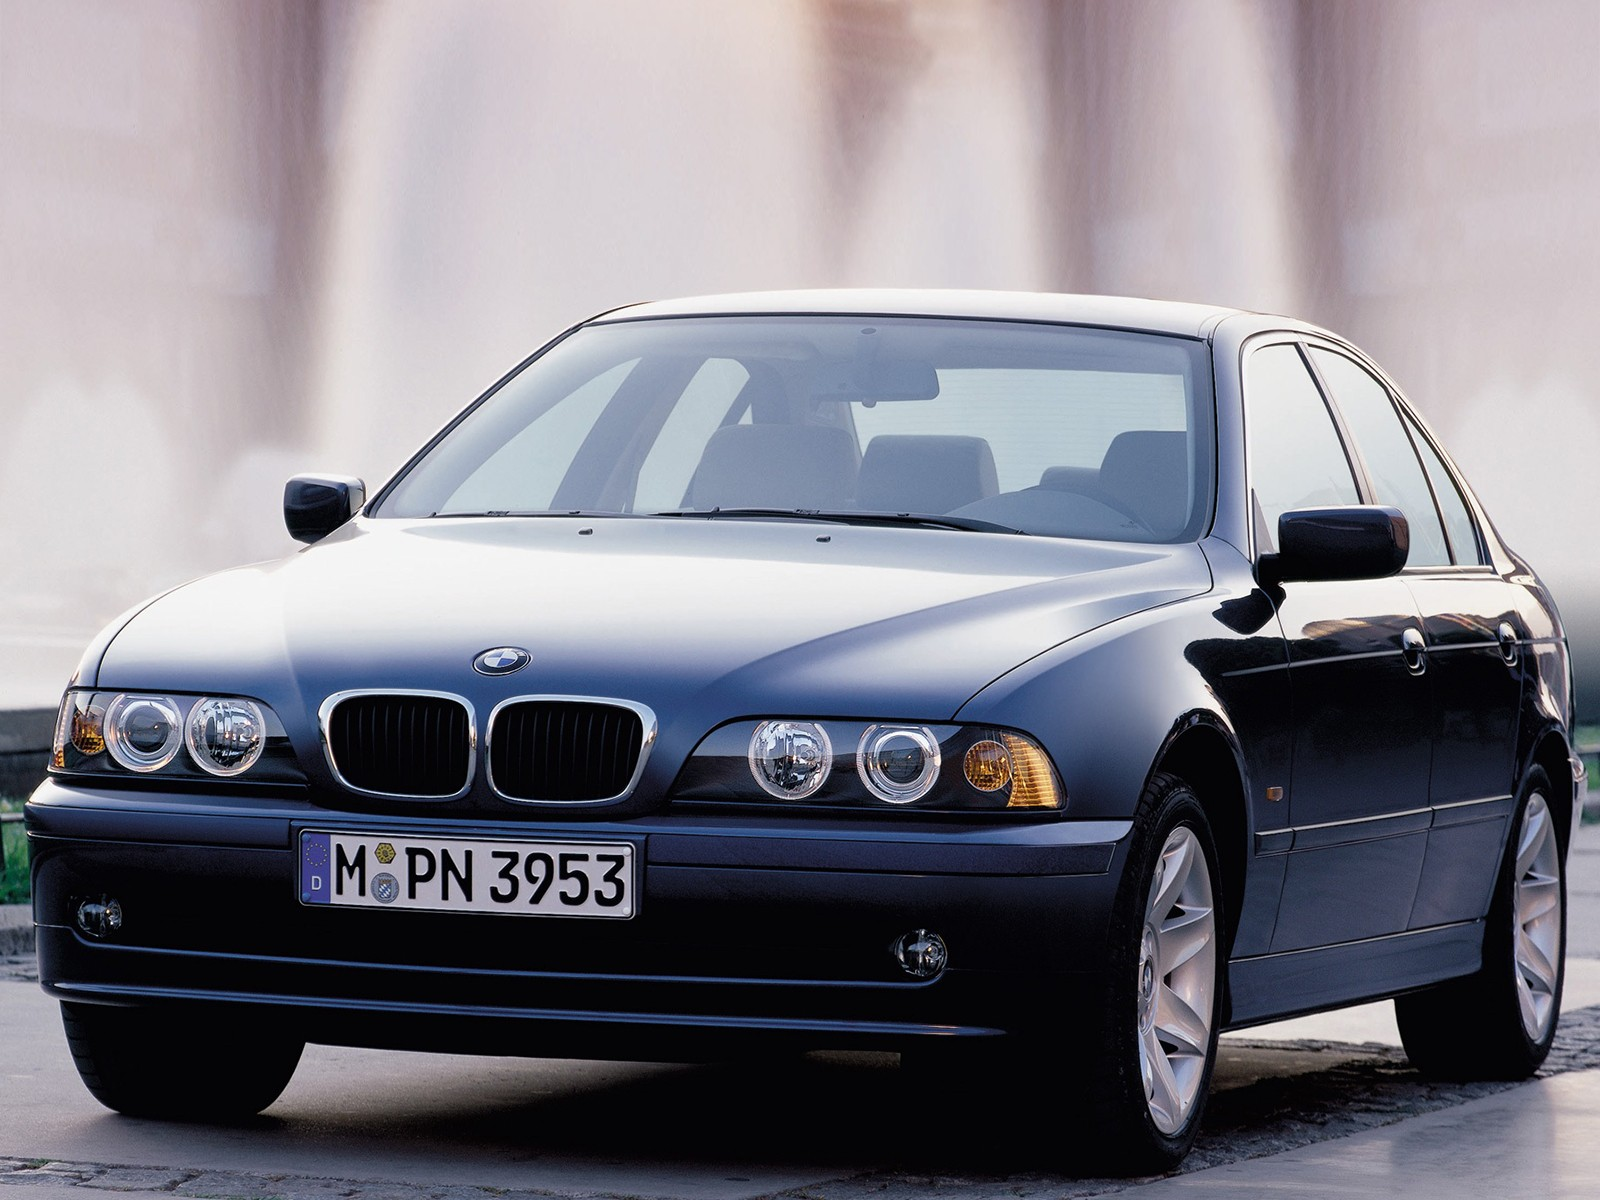 BMW 5 Series (E39) - 2000, 2001, 2002, 2003 - autoevolution